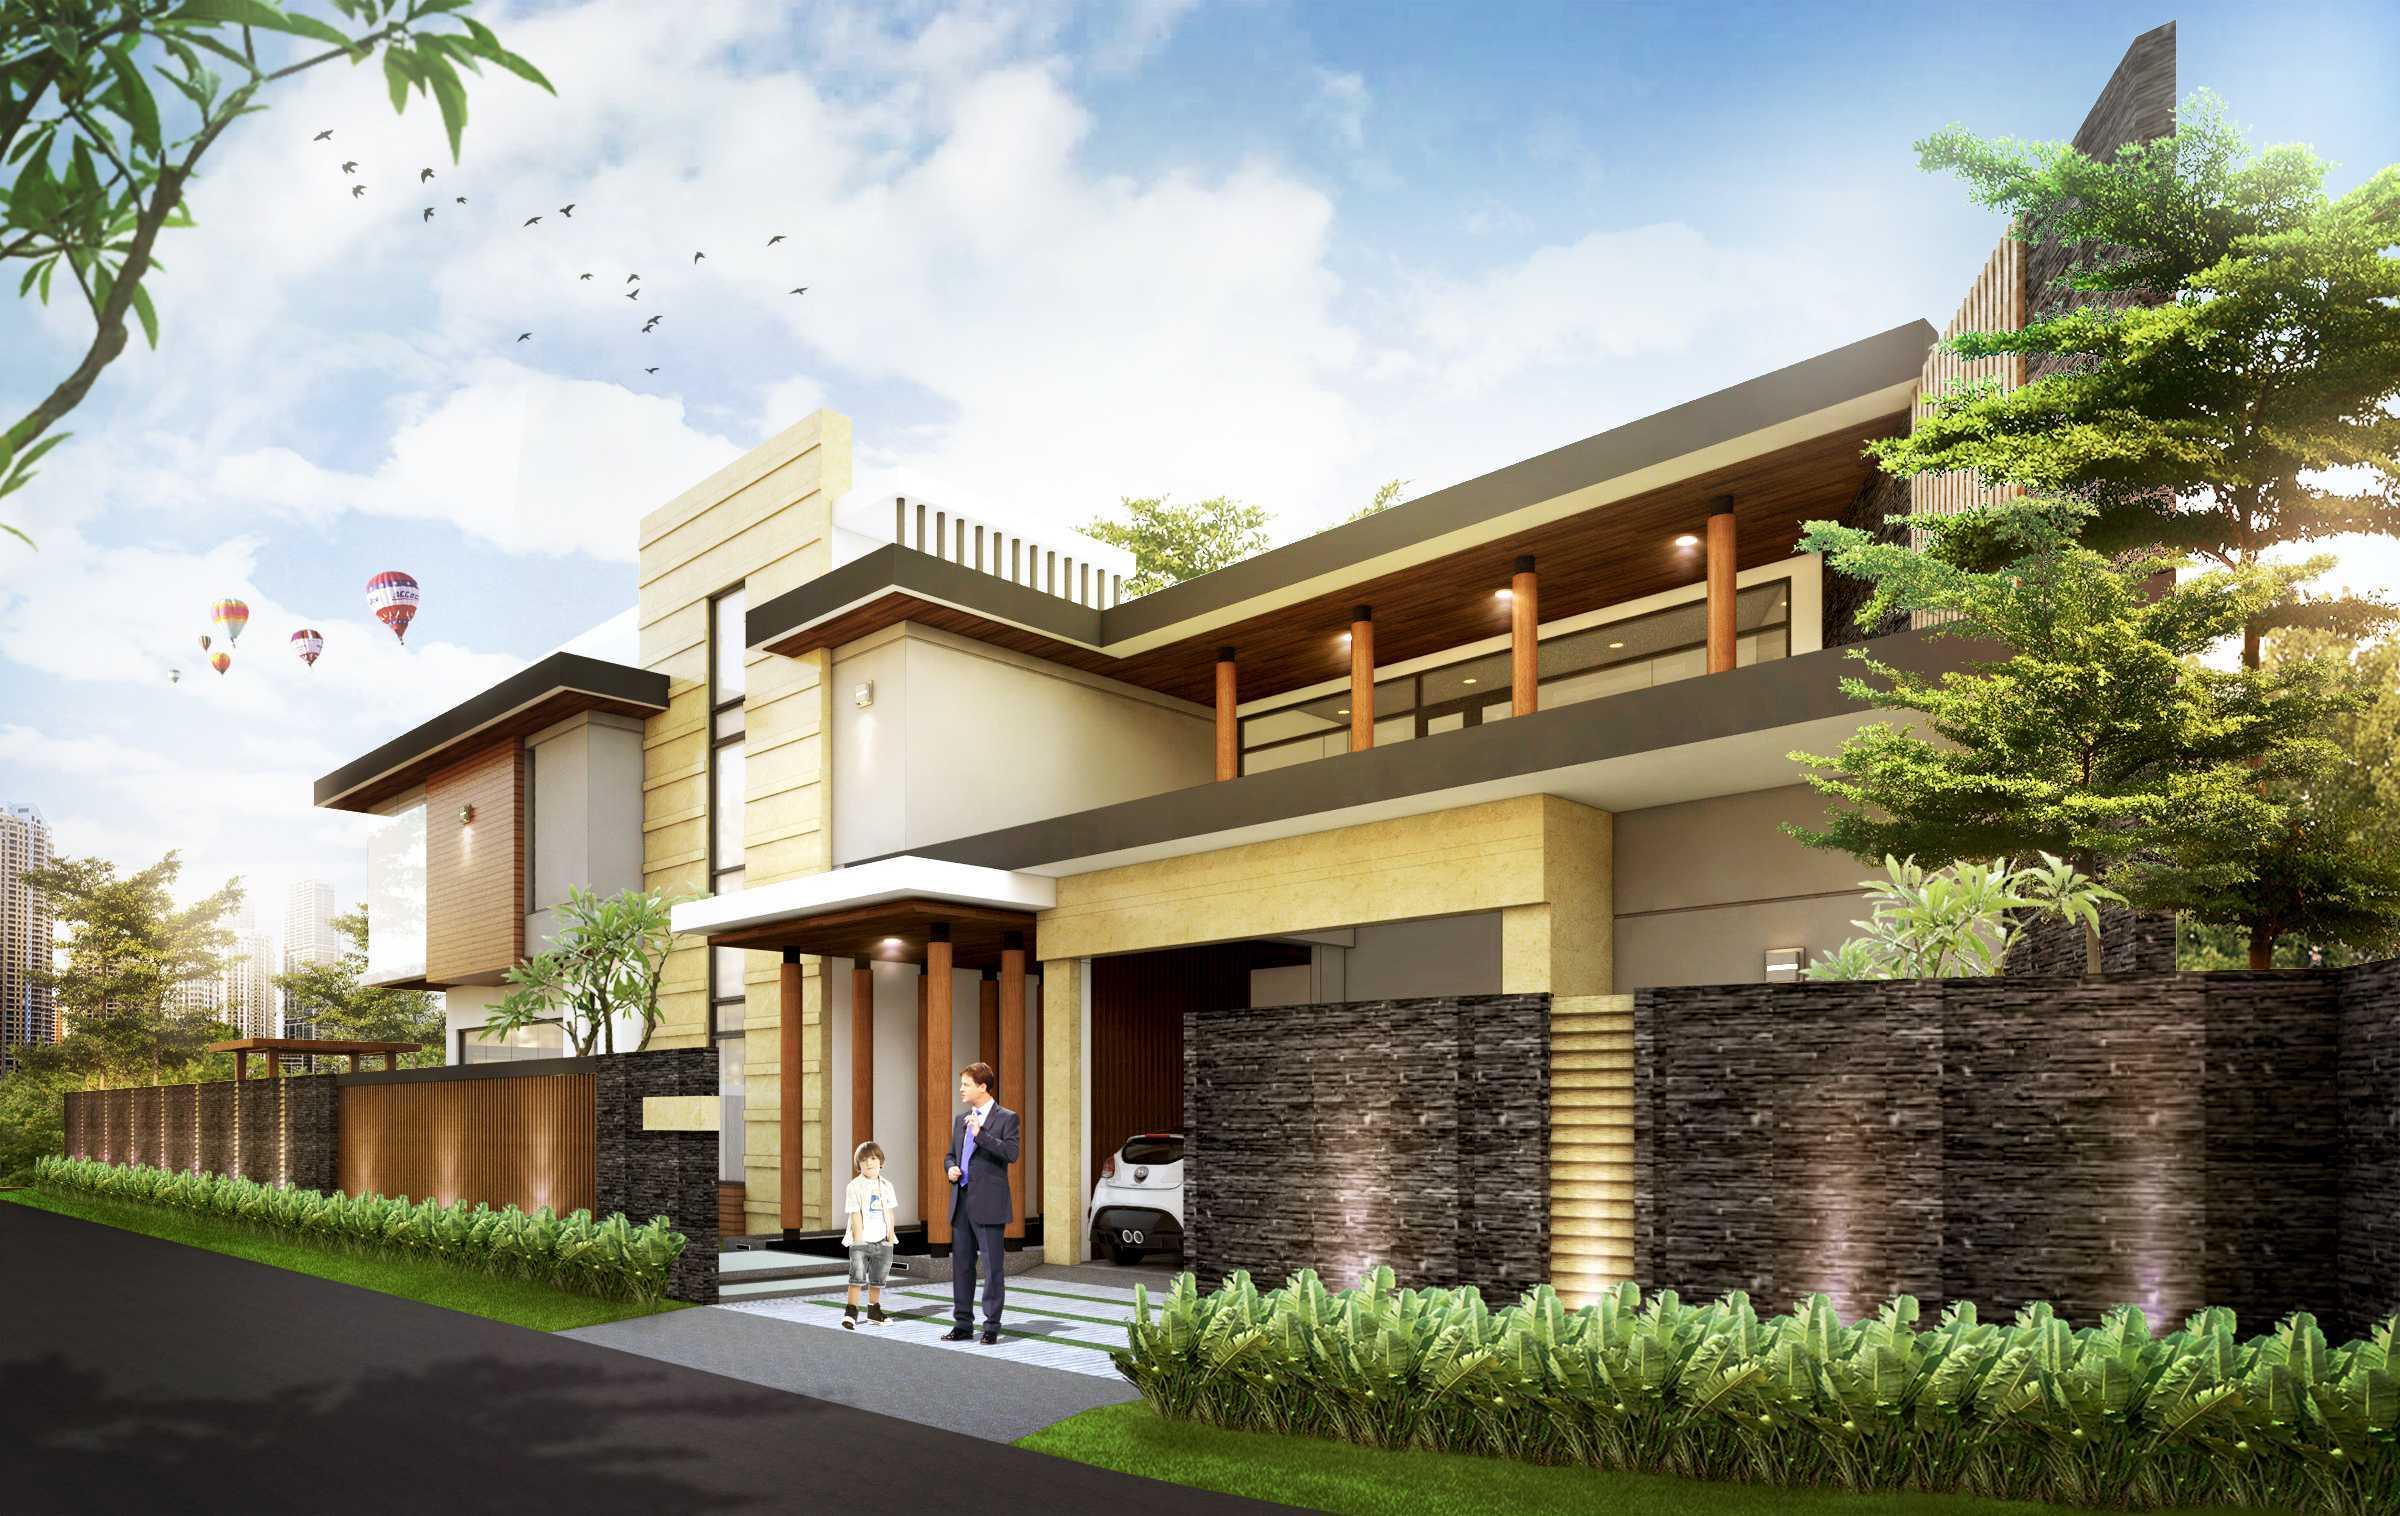 Hendra Budi Architect Privat House Tangerang Tangerang Tangerang Front View - Render Modern  16354